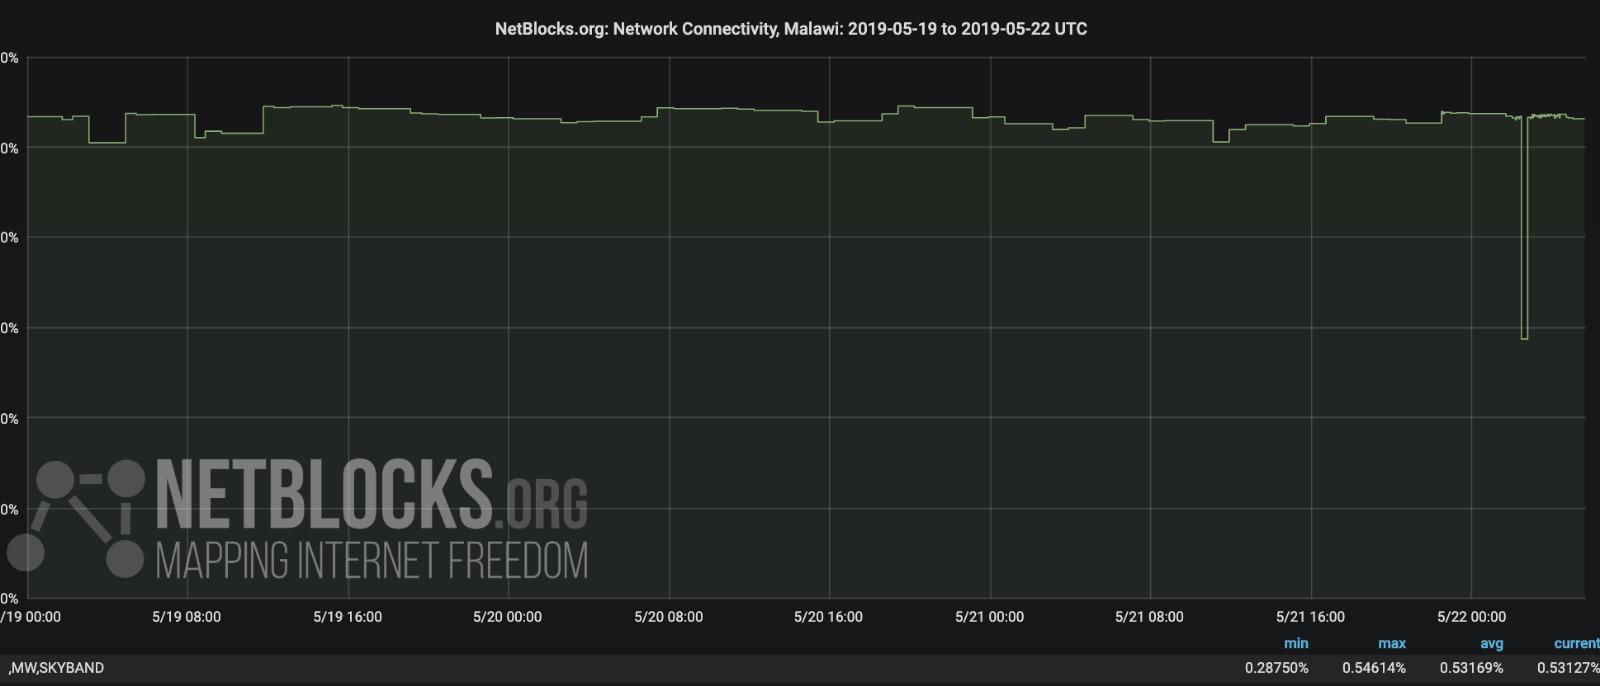 Internet disruption Malawi